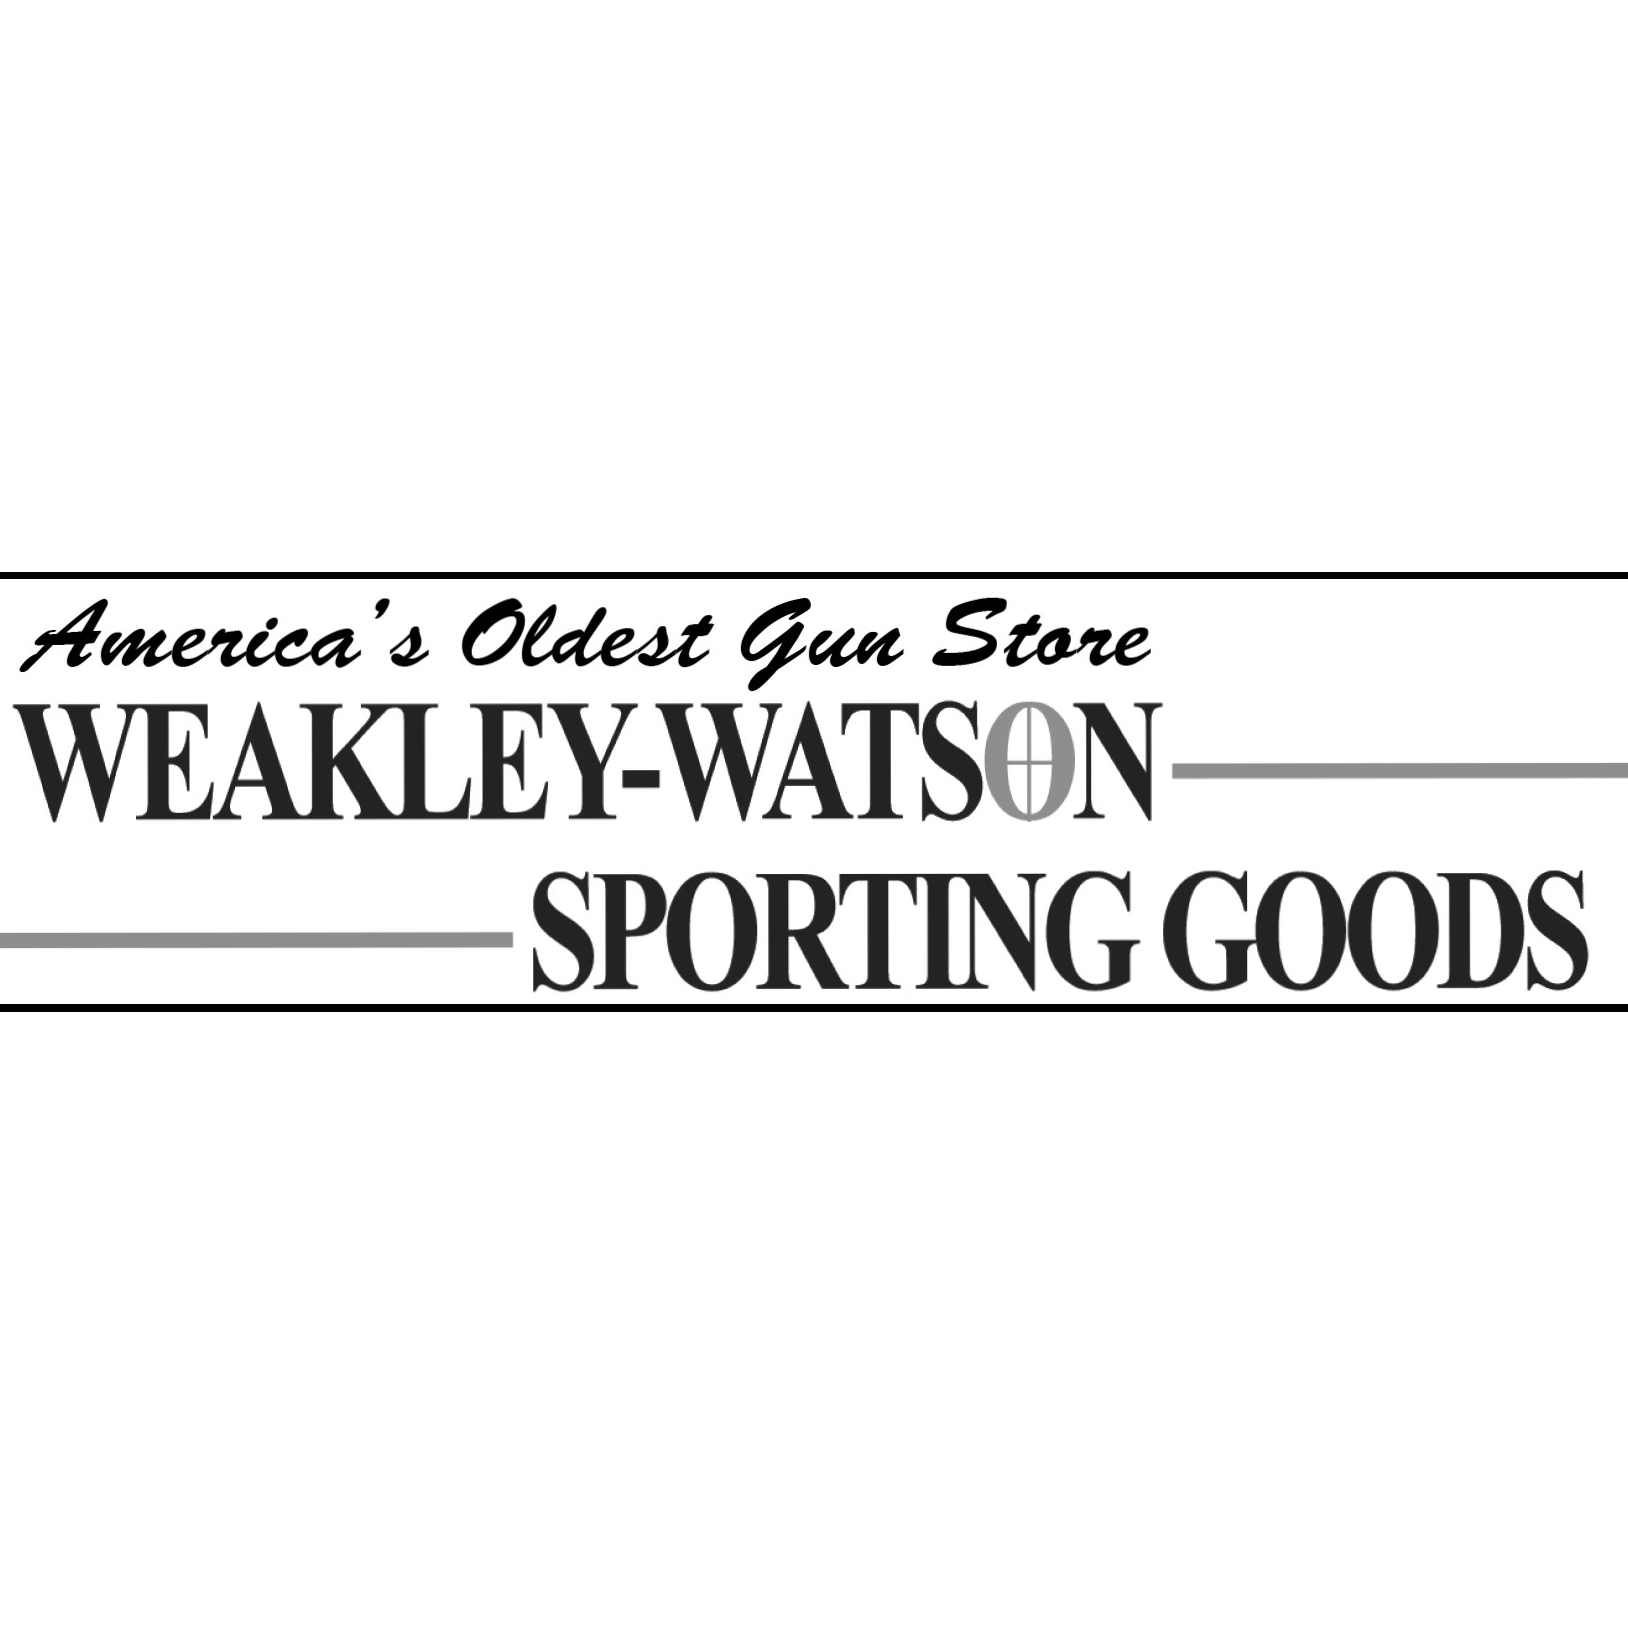 Weakley Watson Sporting Goods Coupons Near Me In Early